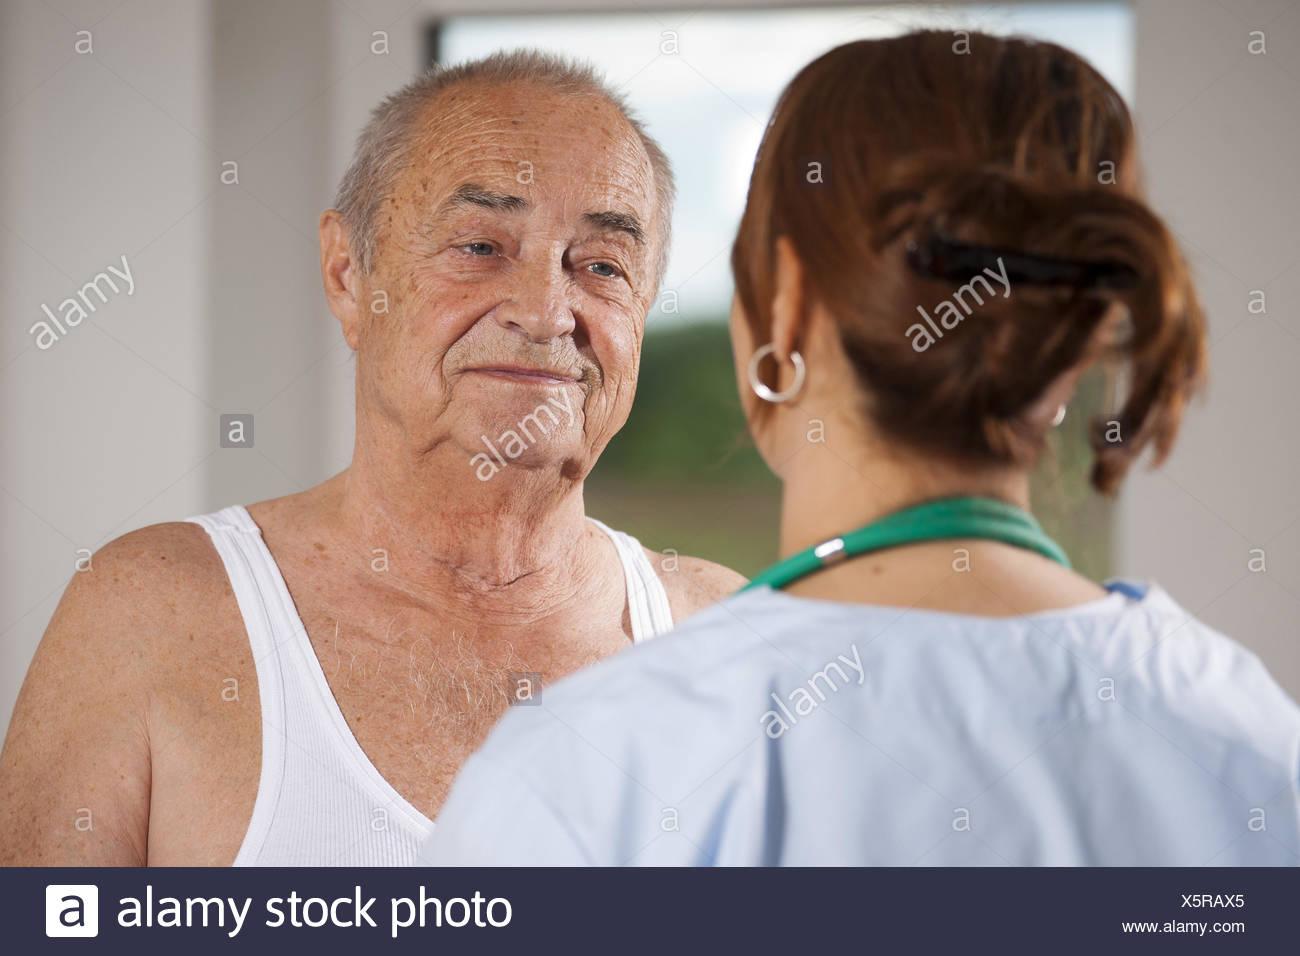 Nurse cares about a senior man, - Stock Image